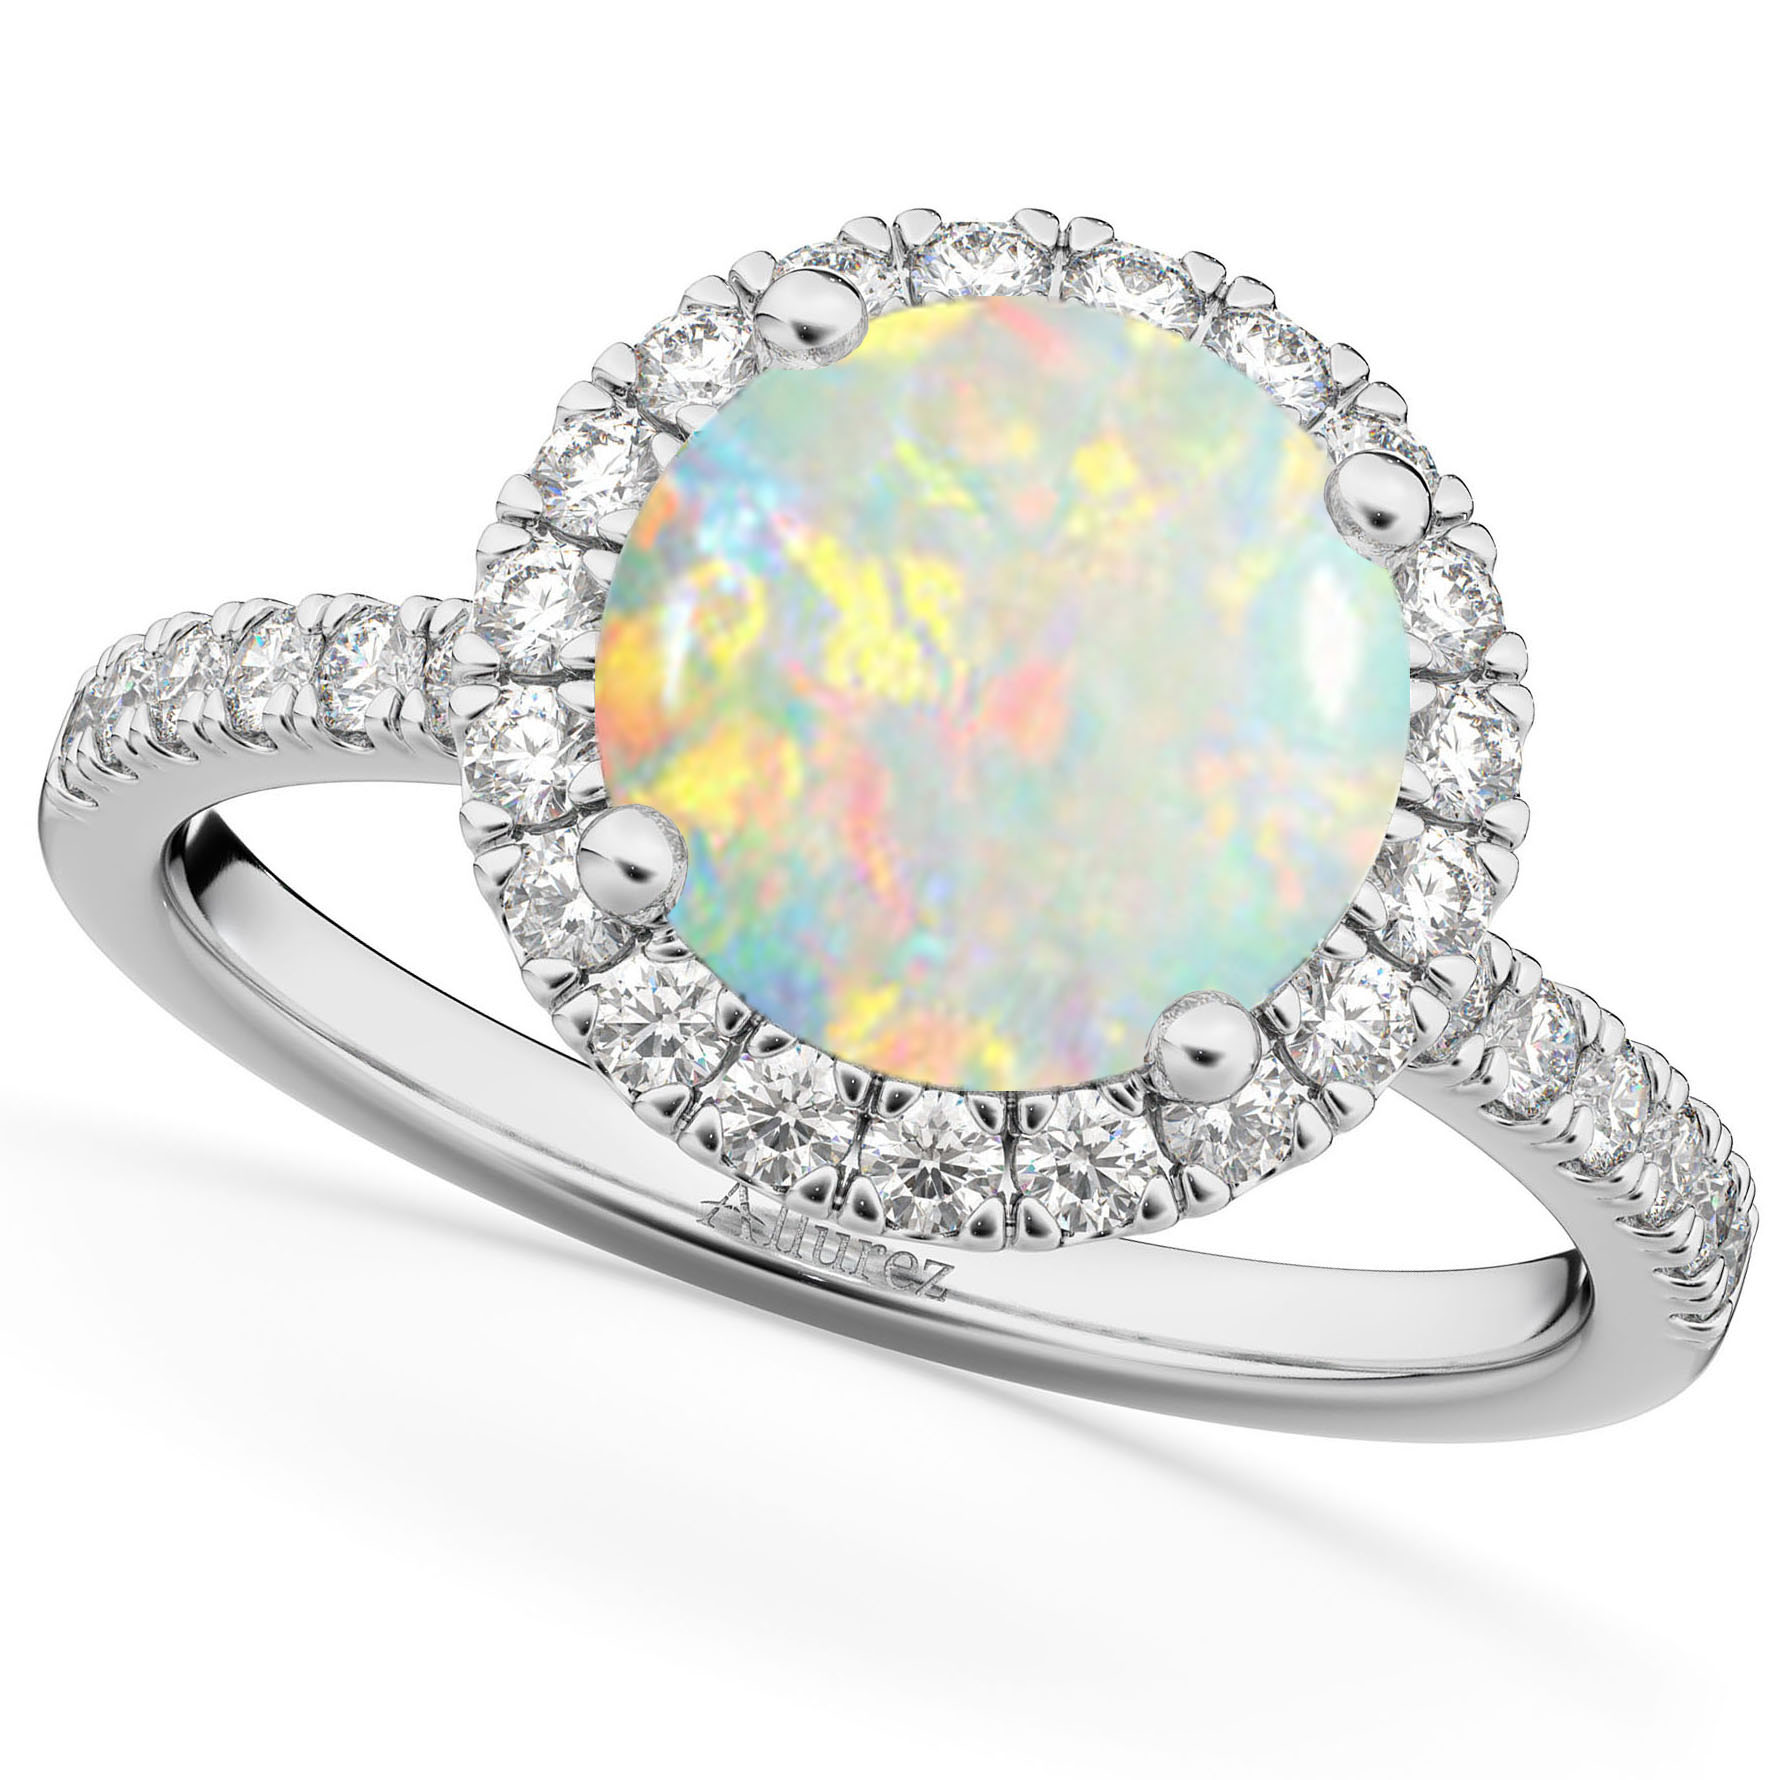 Halo Opal & Diamond Engagement Ring 18K White Gold 1.80ct